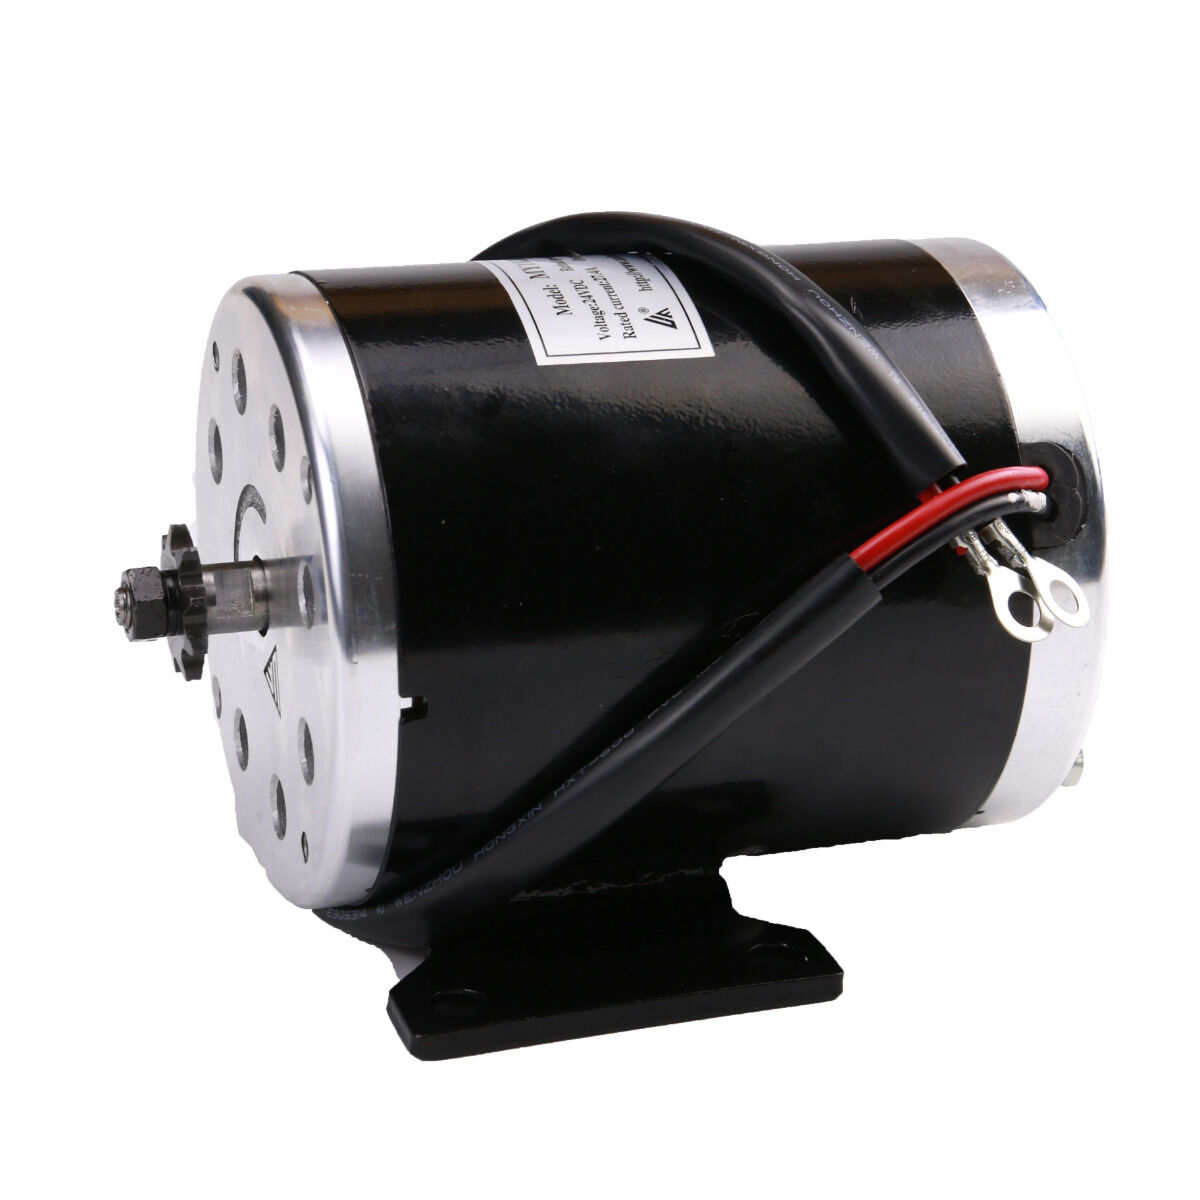 24V 500W BRUSH MOTOR SPEED CONTROLLER CONTROLLER CONTROLLER THrossoTLE GRIP FOR E-Bike ATV SCOOTER Cart fce55b